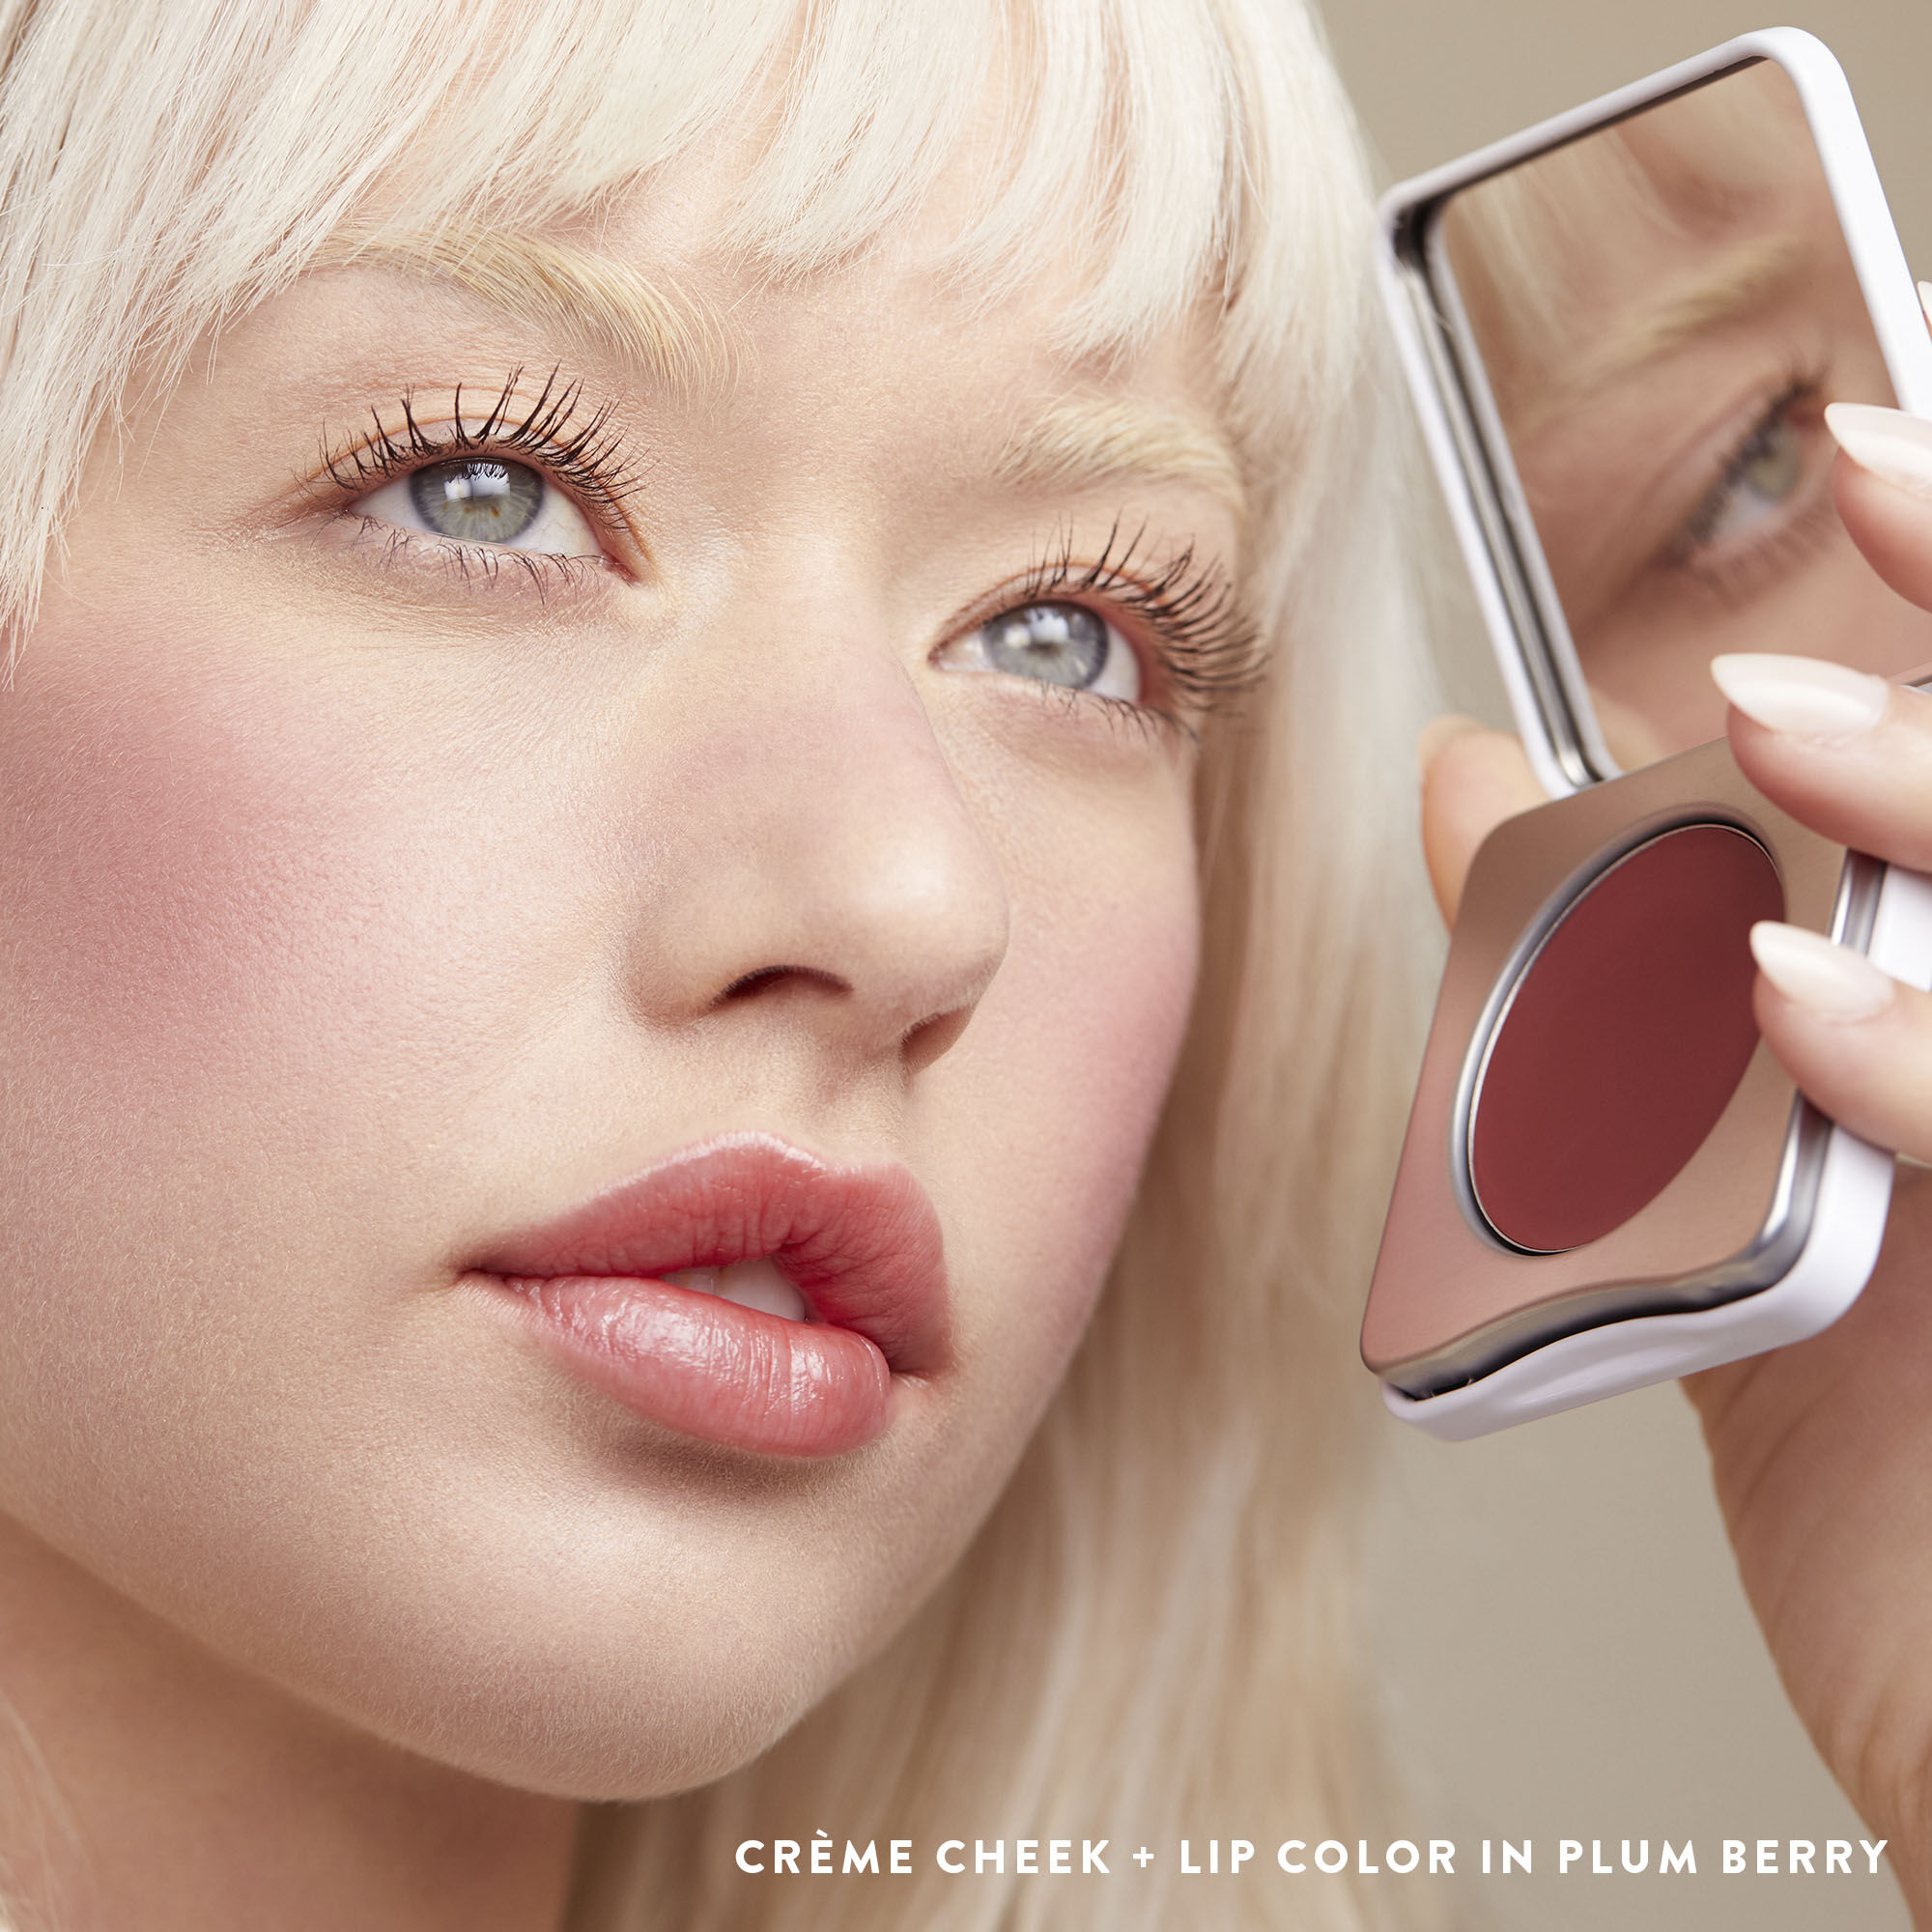 Creme Cheek + Lip Color